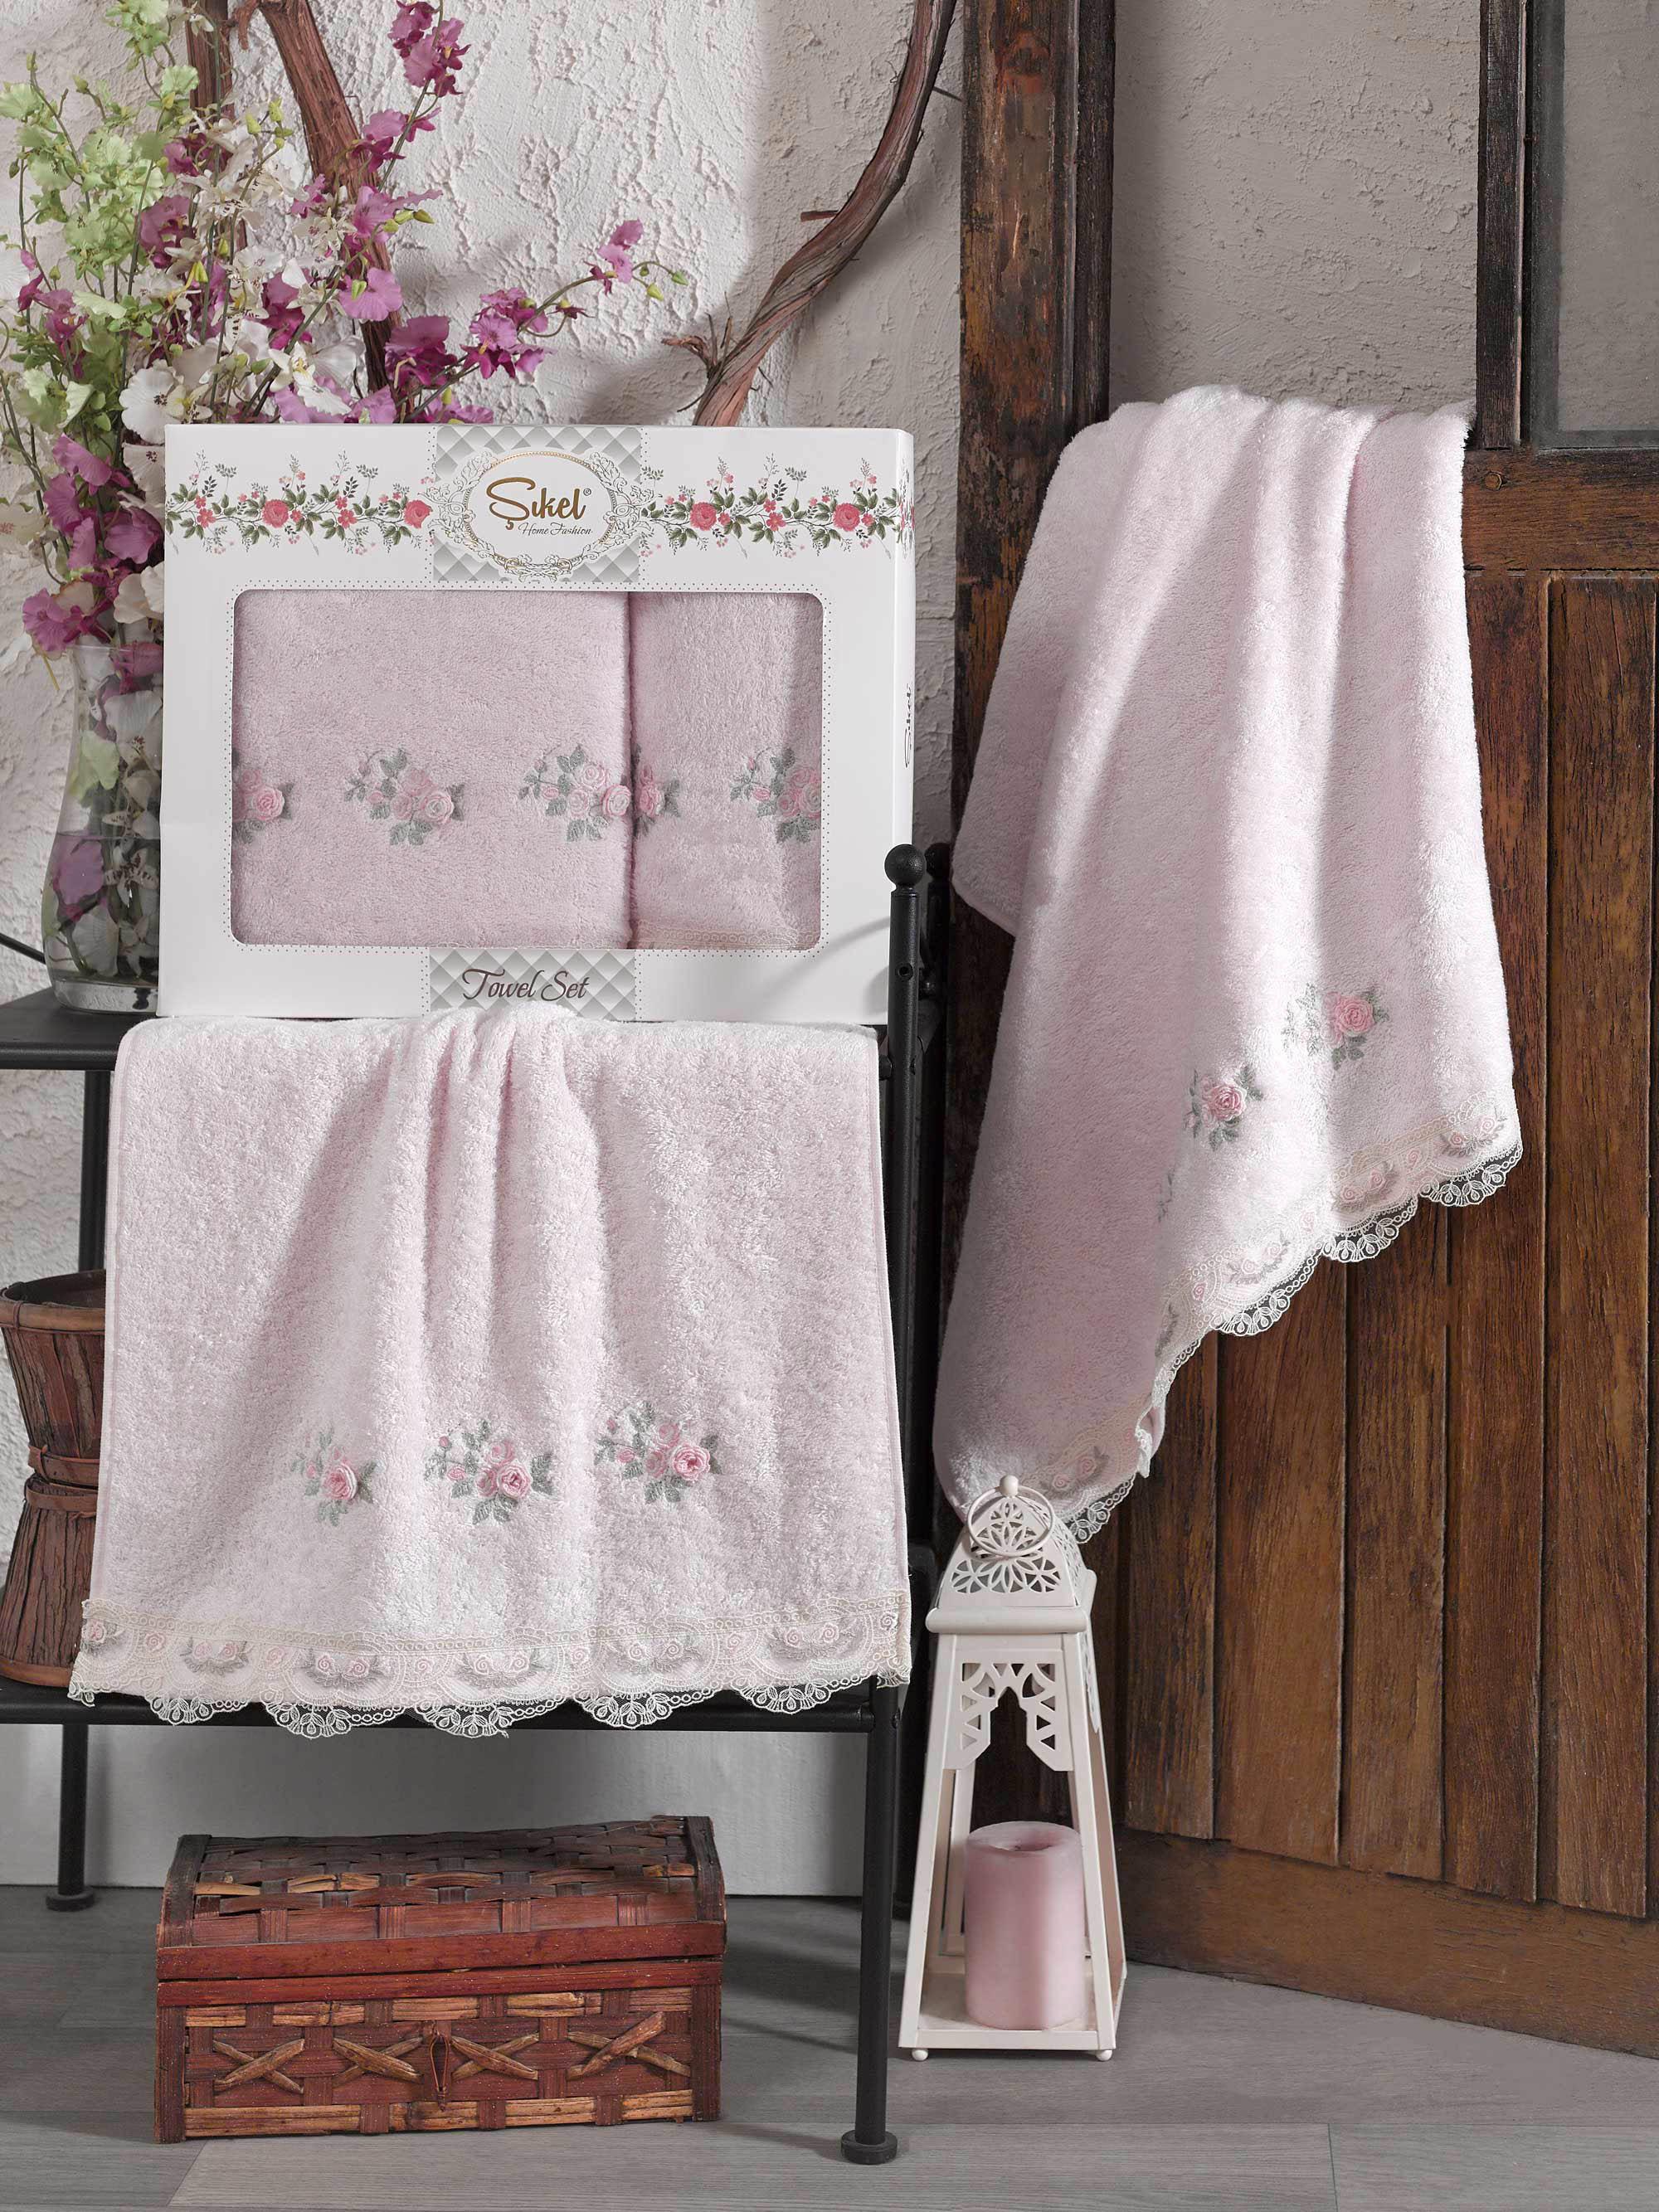 Полотенца Sikel Полотенце London Цвет: Розовый (50х90 см,70х140 см) sikel набор из 2 полотенец nazande цвет коричневый